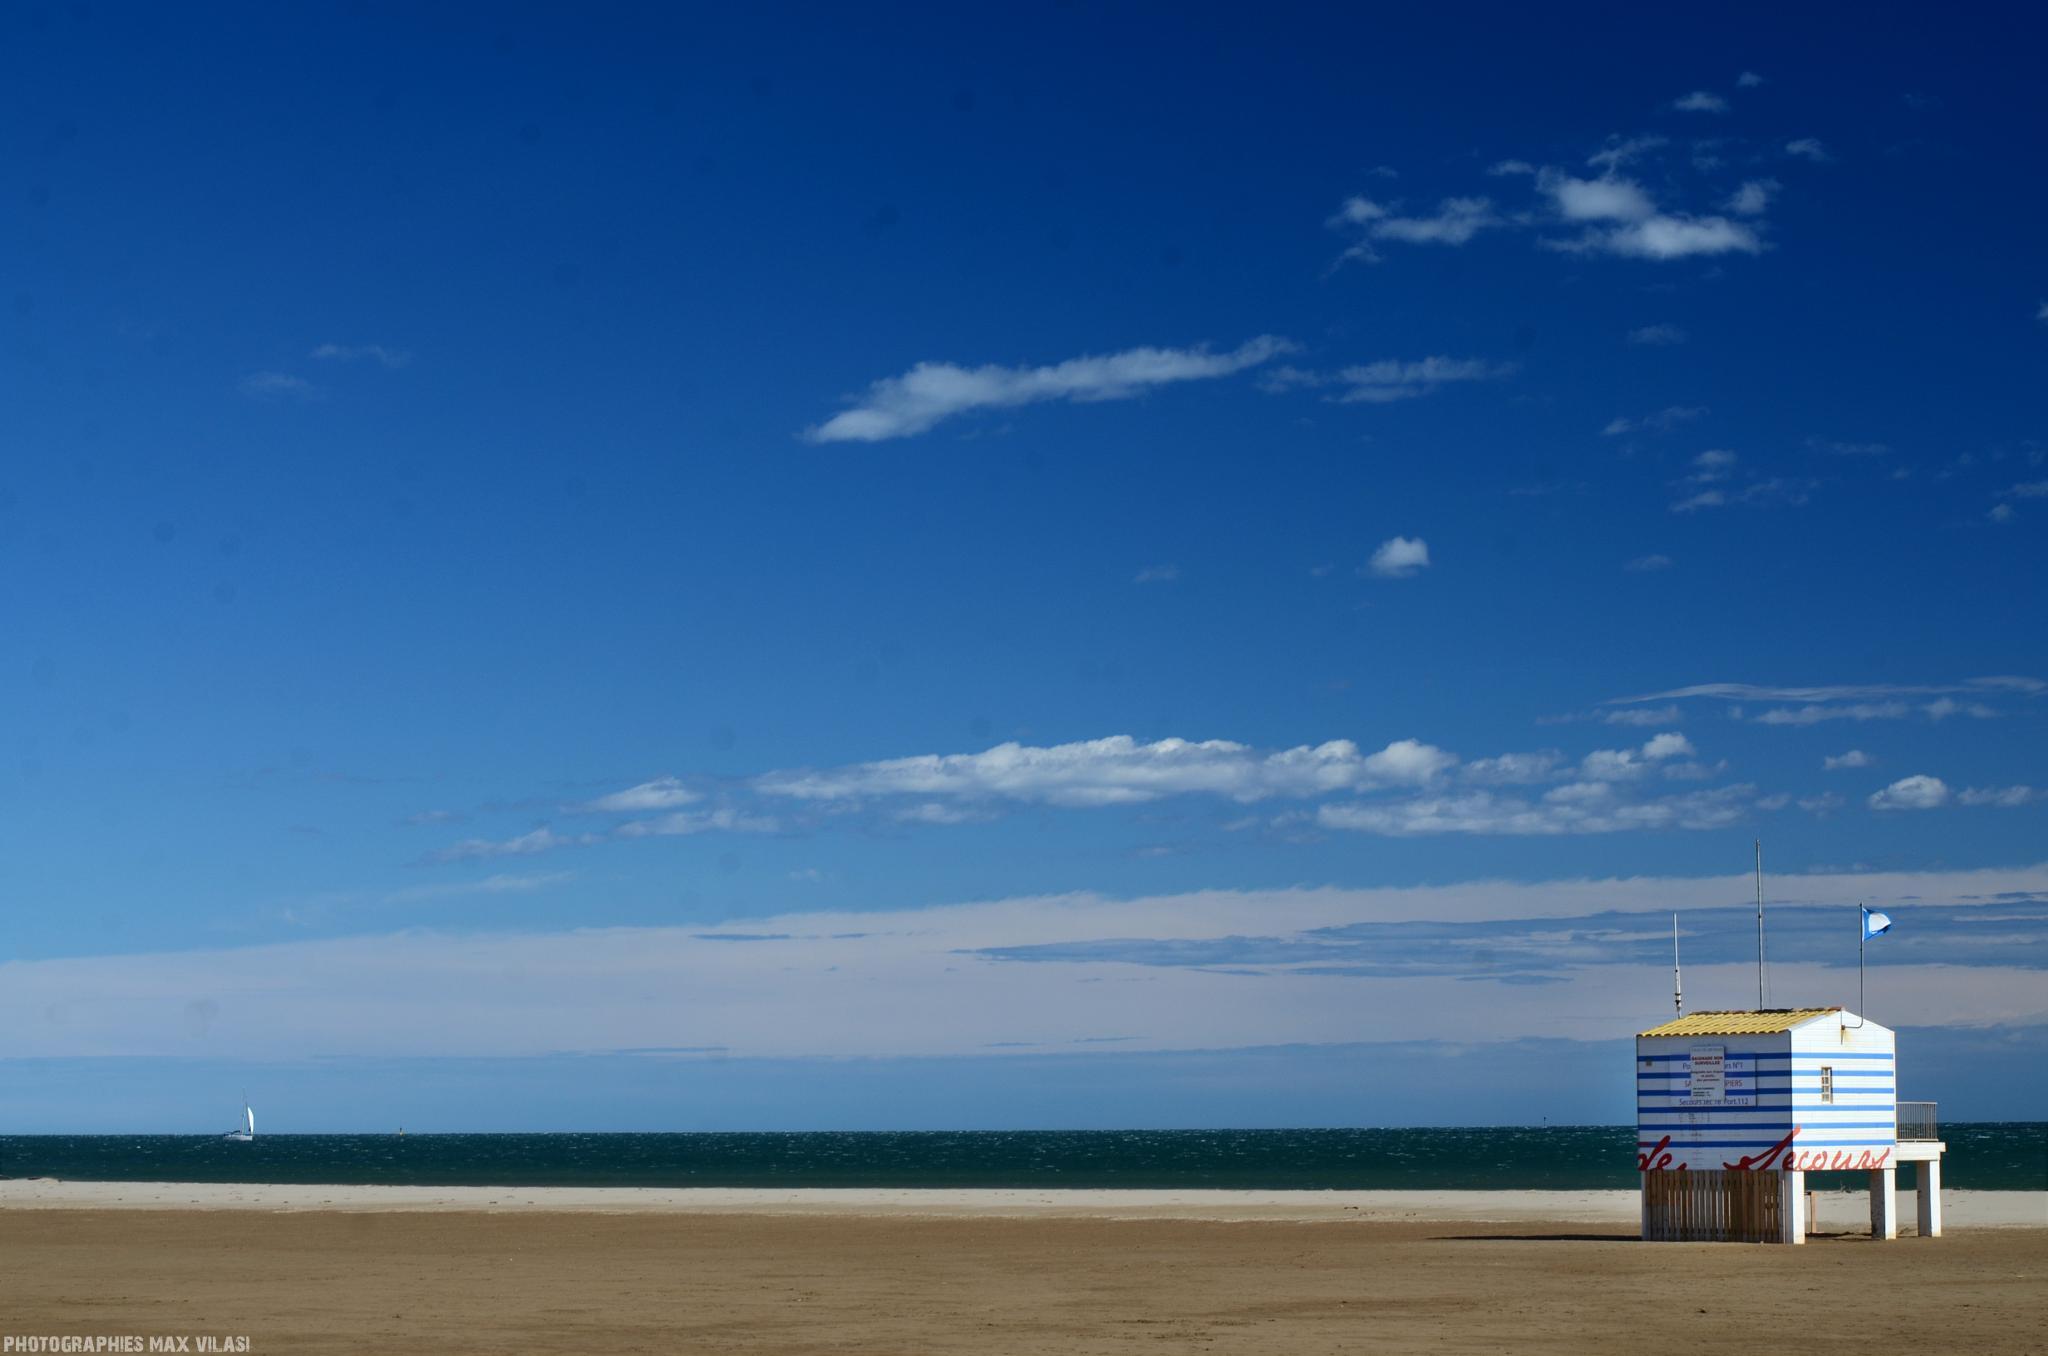 Blue Season by Max Vilasi